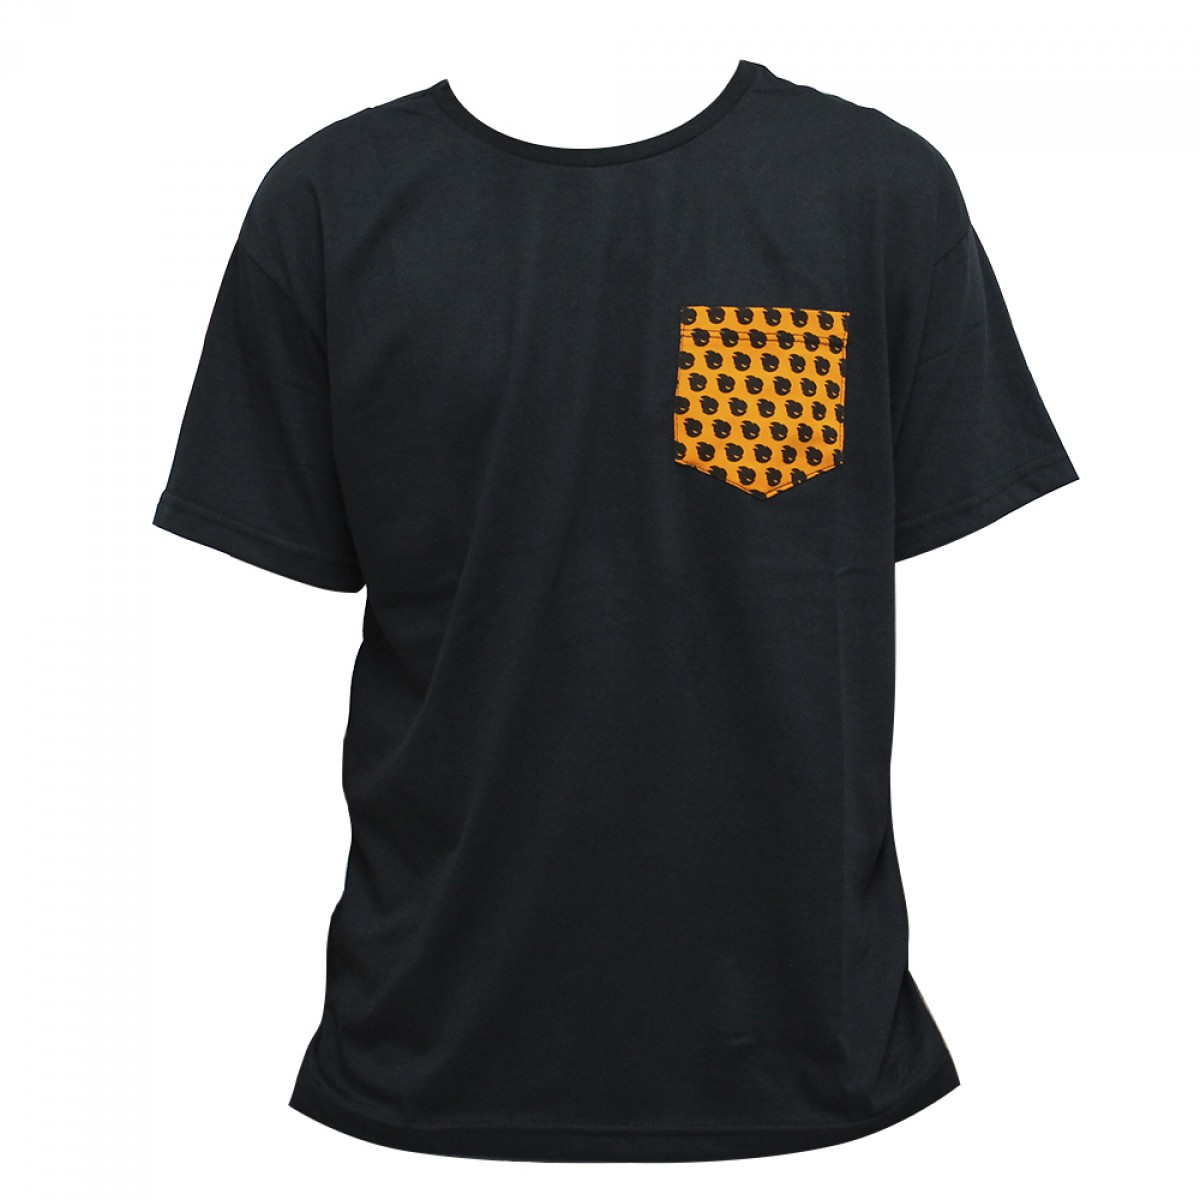 Camiseta Terabyteshop, Unisex, Manga Curta, Algodão, Preto e Laranja, Bolso (G)